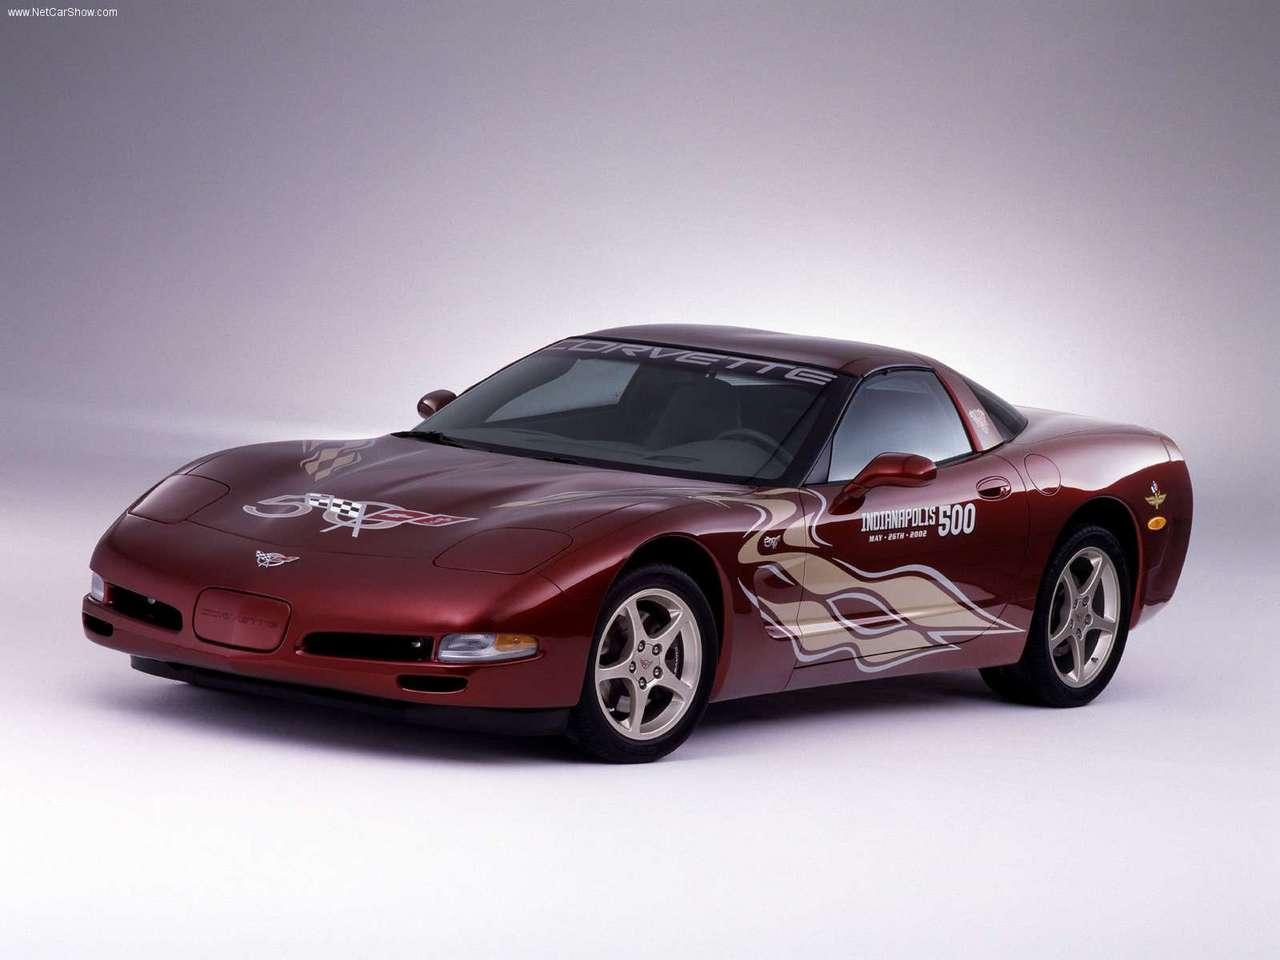 http://3.bp.blogspot.com/-OR2ffTaAL7M/TYgyFnRuVEI/AAAAAAAAOAI/Ocx4AqYA27o/s1600/Chevrolet-Corvette_Indy_500_Pace_Car_2002_1280x960_wallpaper_01.jpg